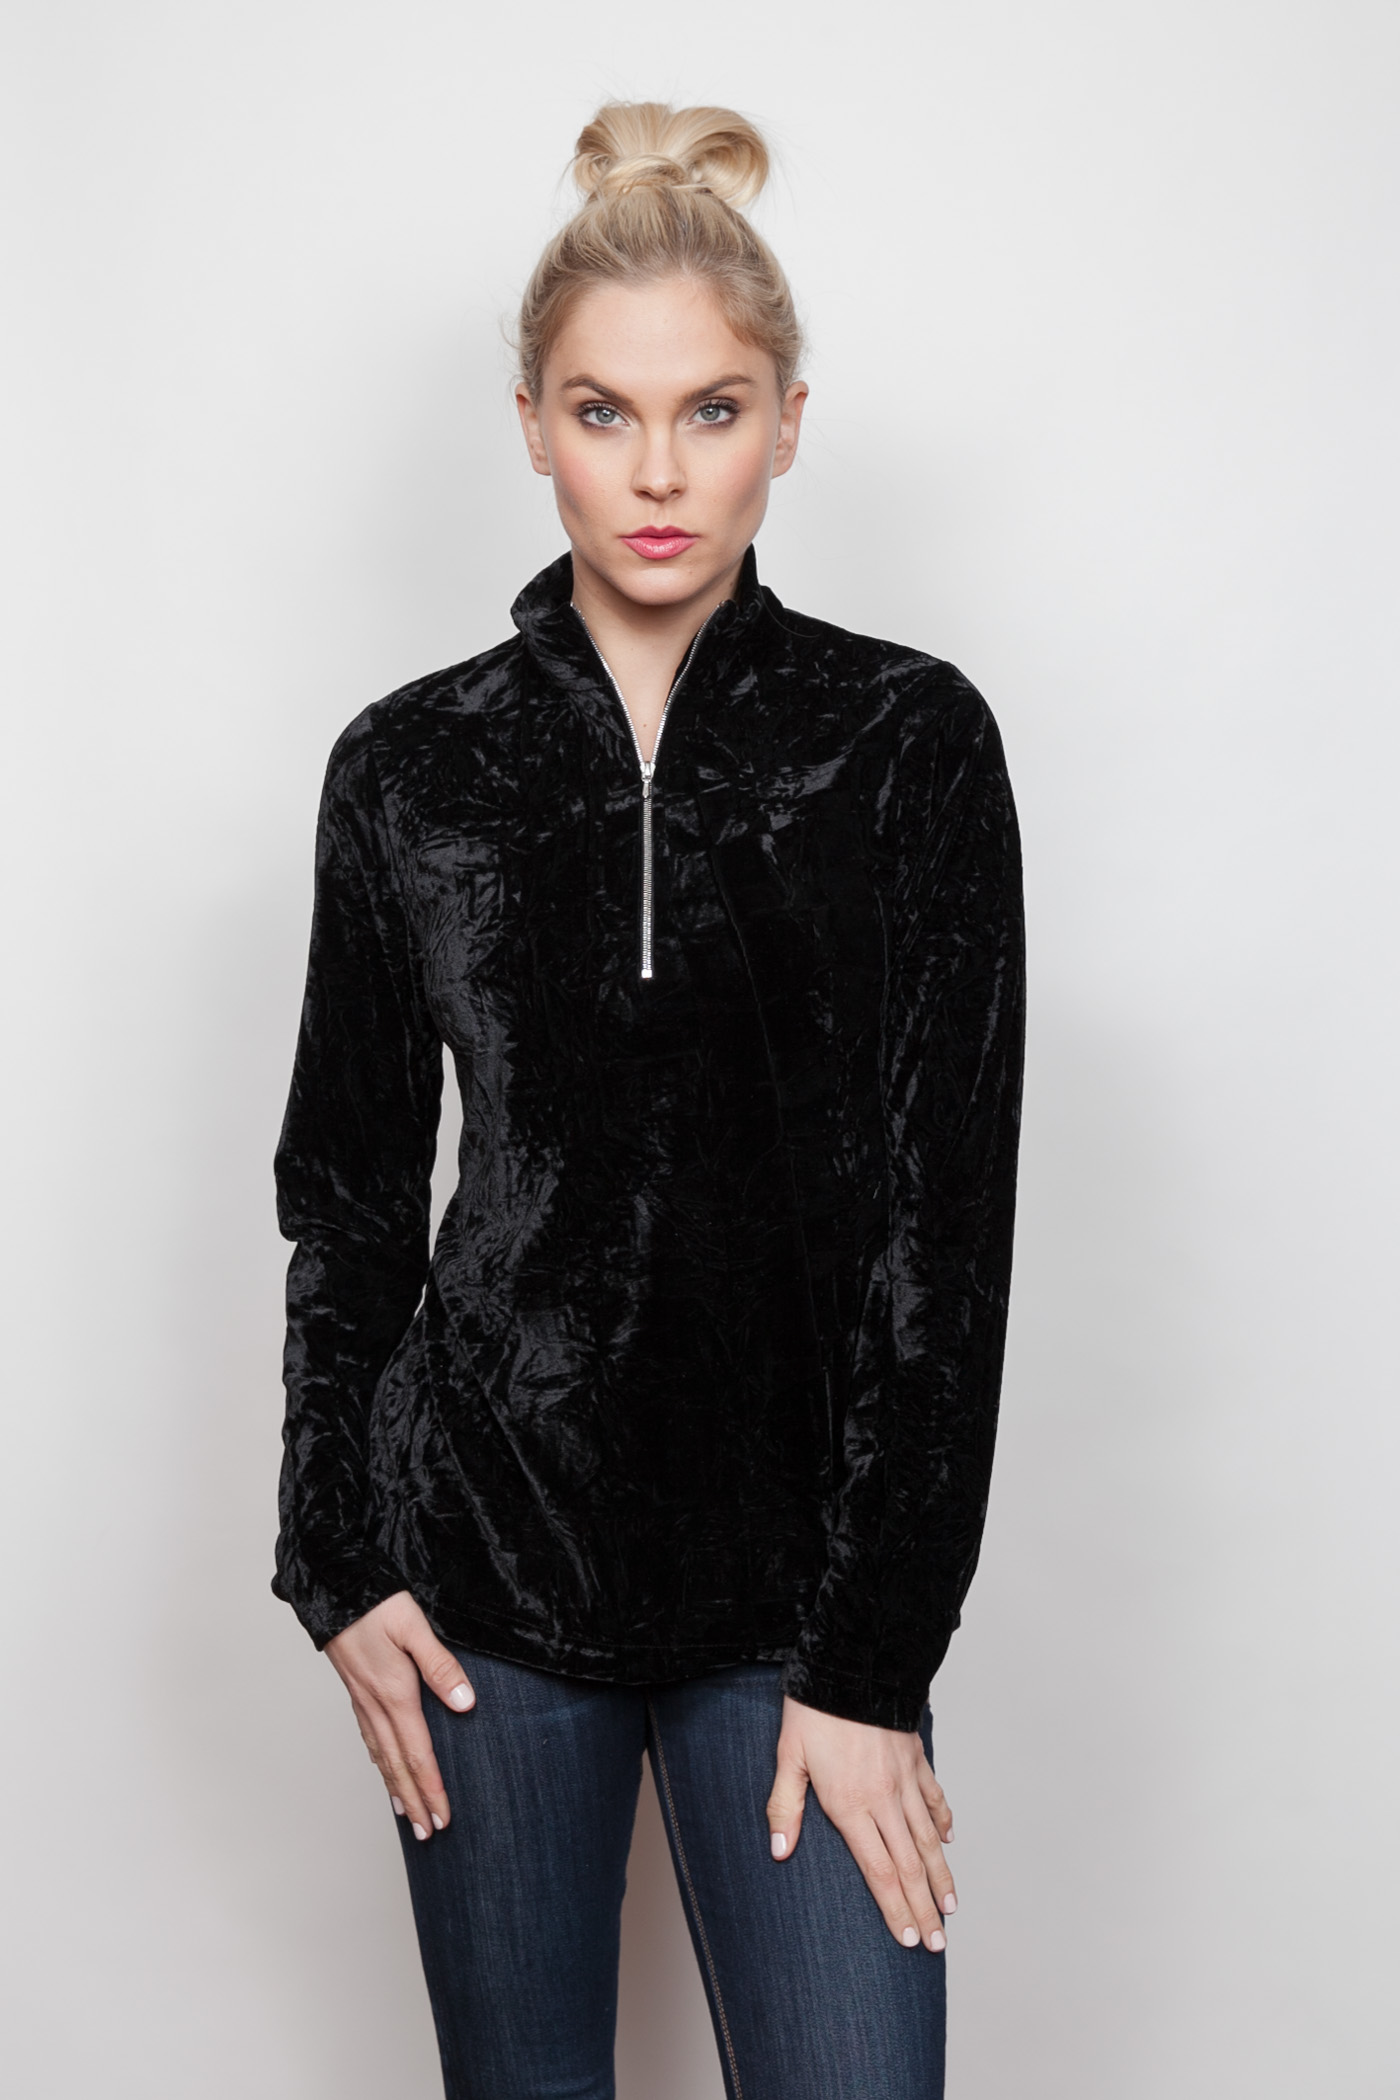 Copy of Style # 15449-18, p 12 </br>Crinkled Crushed Velvet </br>Color: Black + Merlot, Sapphire